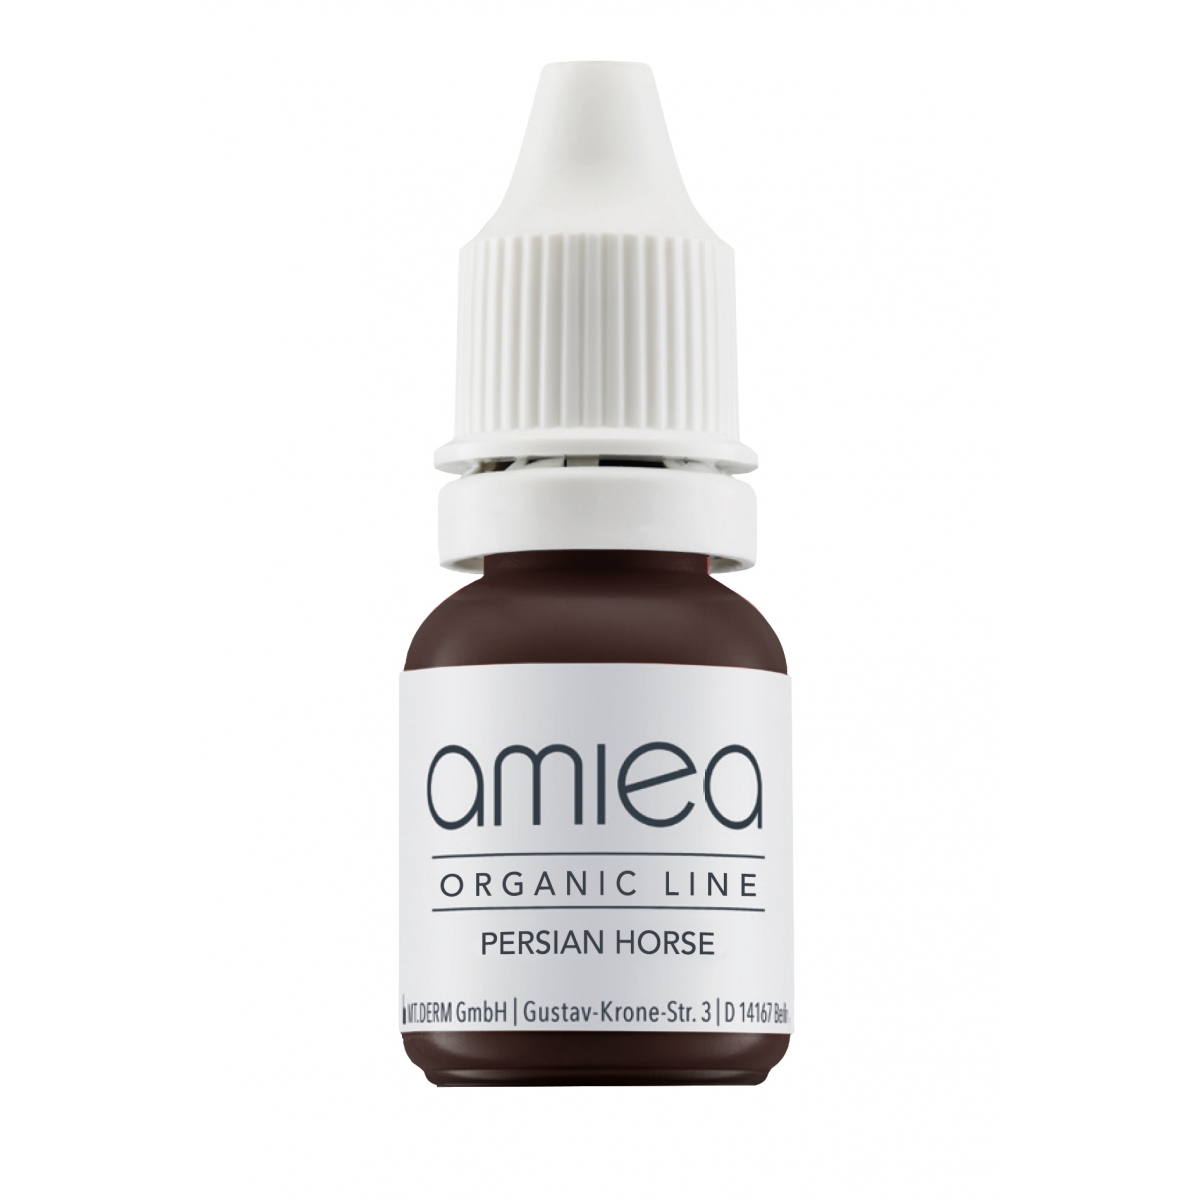 Organicline (5 ml)  - PIGMENTS AMIEA ORGANICLINE PERSIAN HORSE, Flacon 5 ml